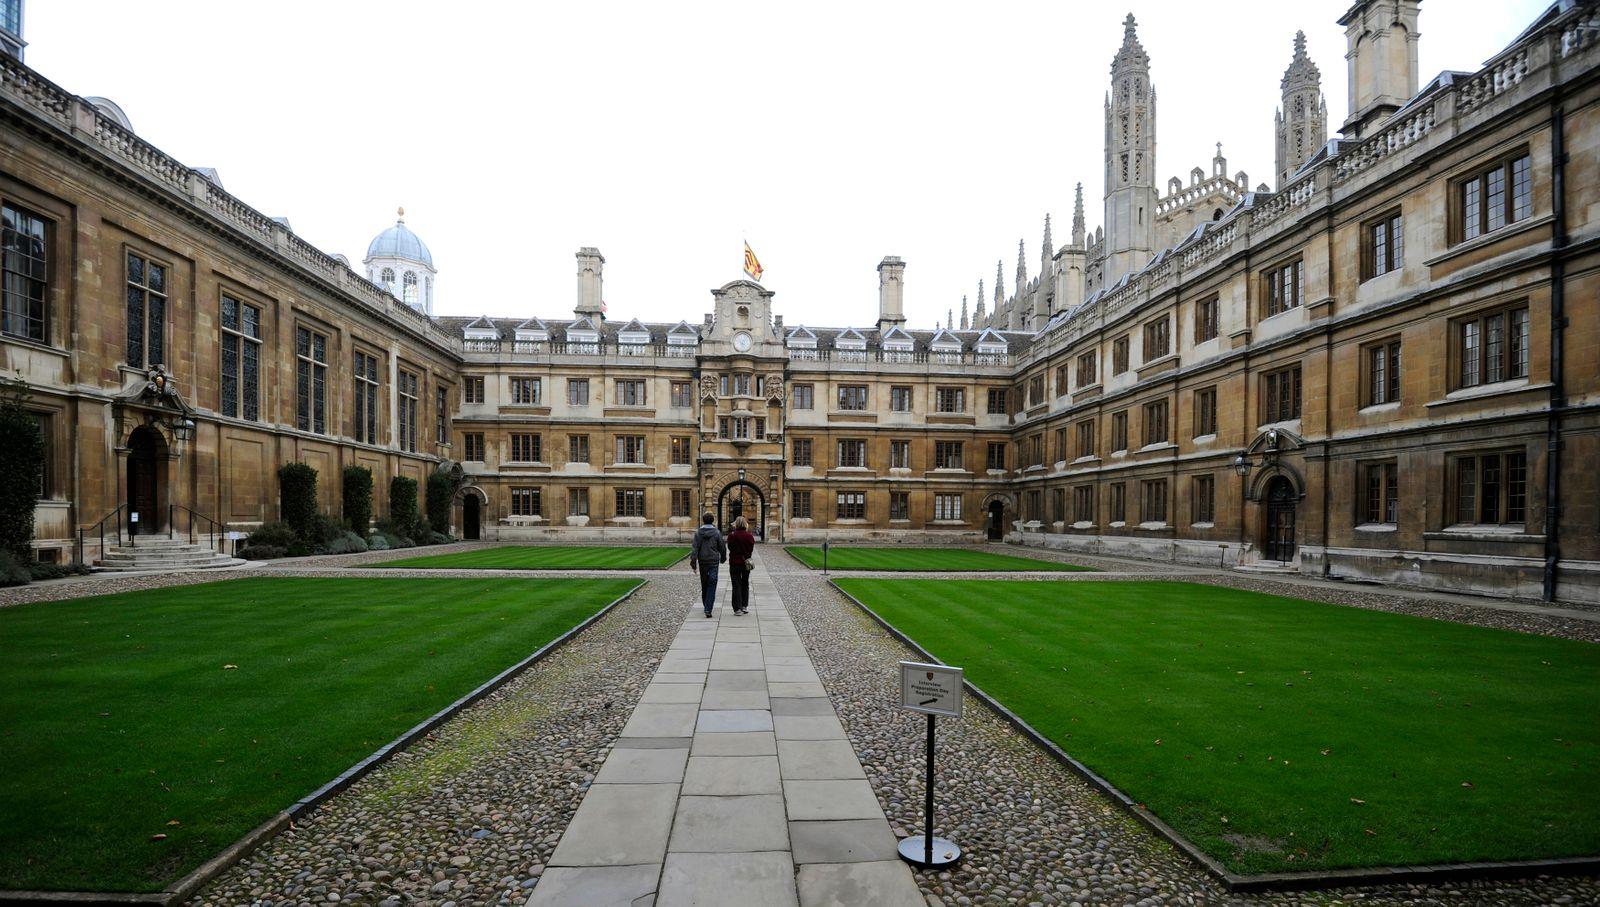 People walk through Clare College at Cambridge University